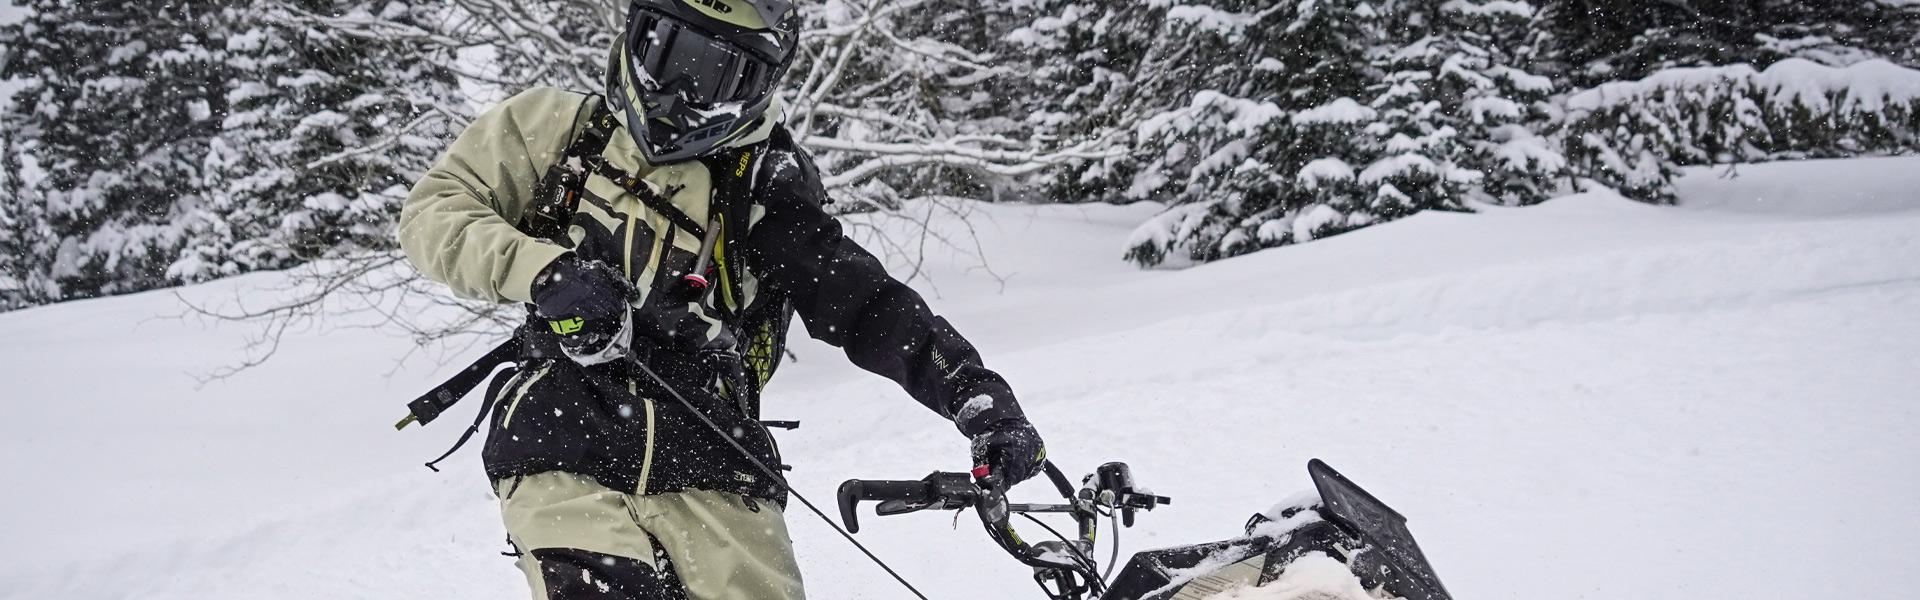 509 Khaki Evolve Jacket Shell Starting Snowmobile